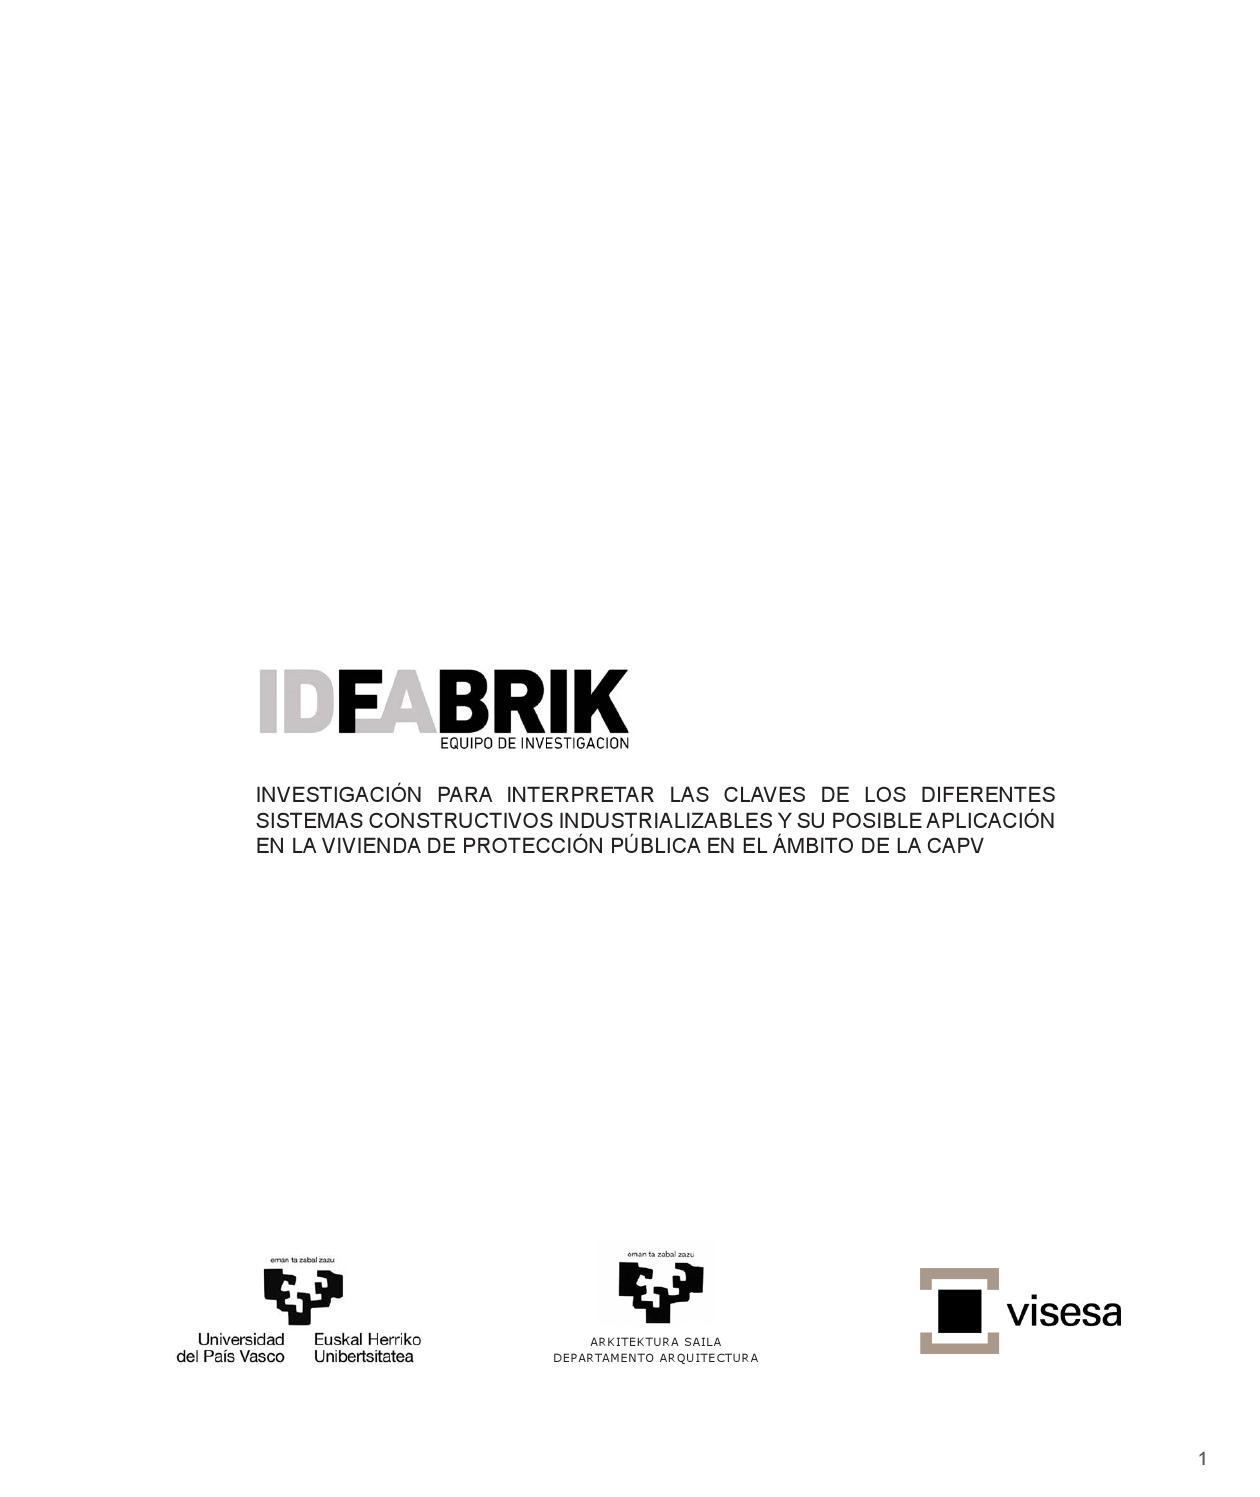 IDEAFABRIK by View arkitektura - issuu